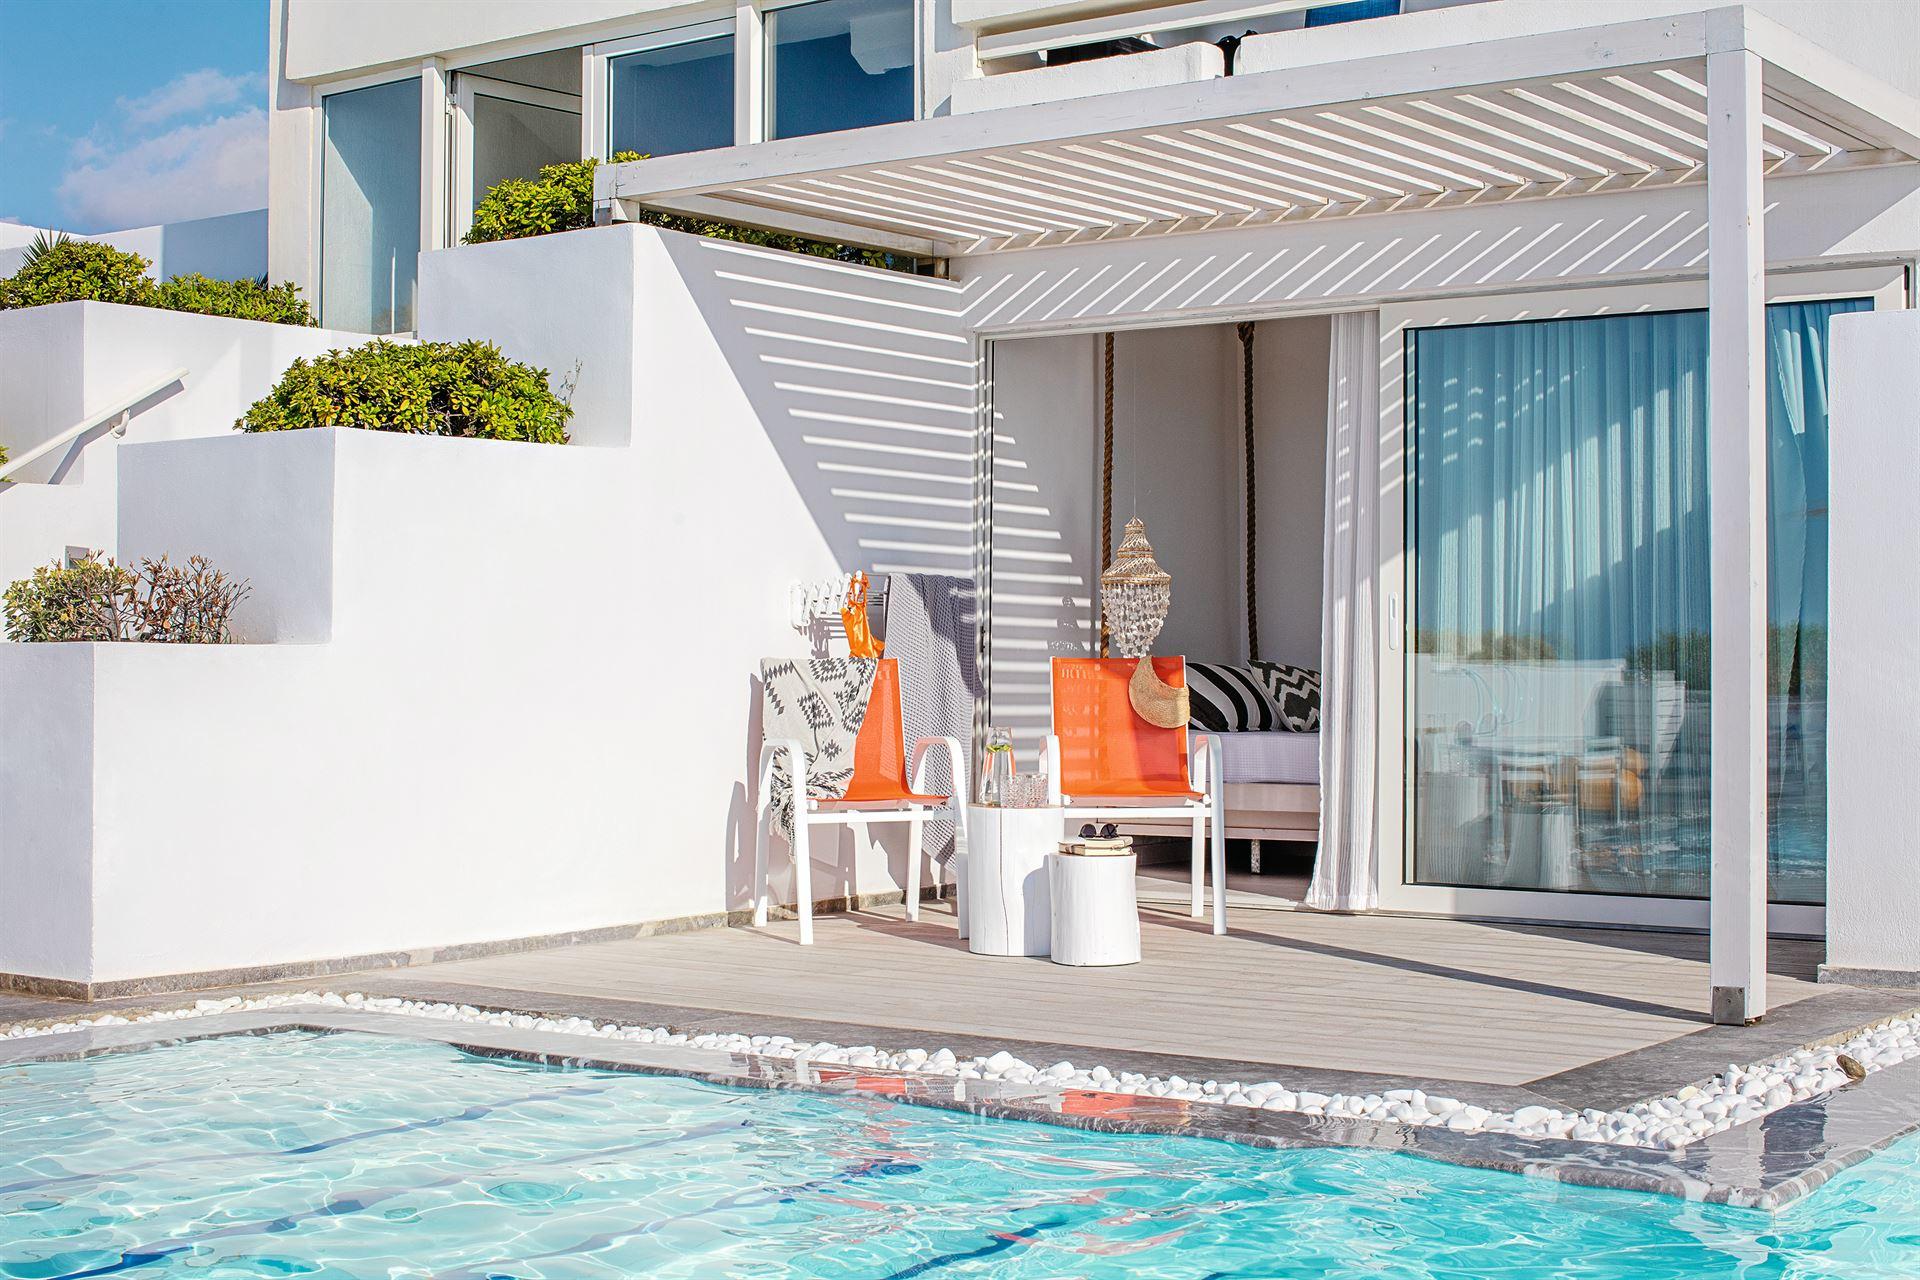 Grecotel LUX ME White Palace: Lux.me Swim Up Bgl SV